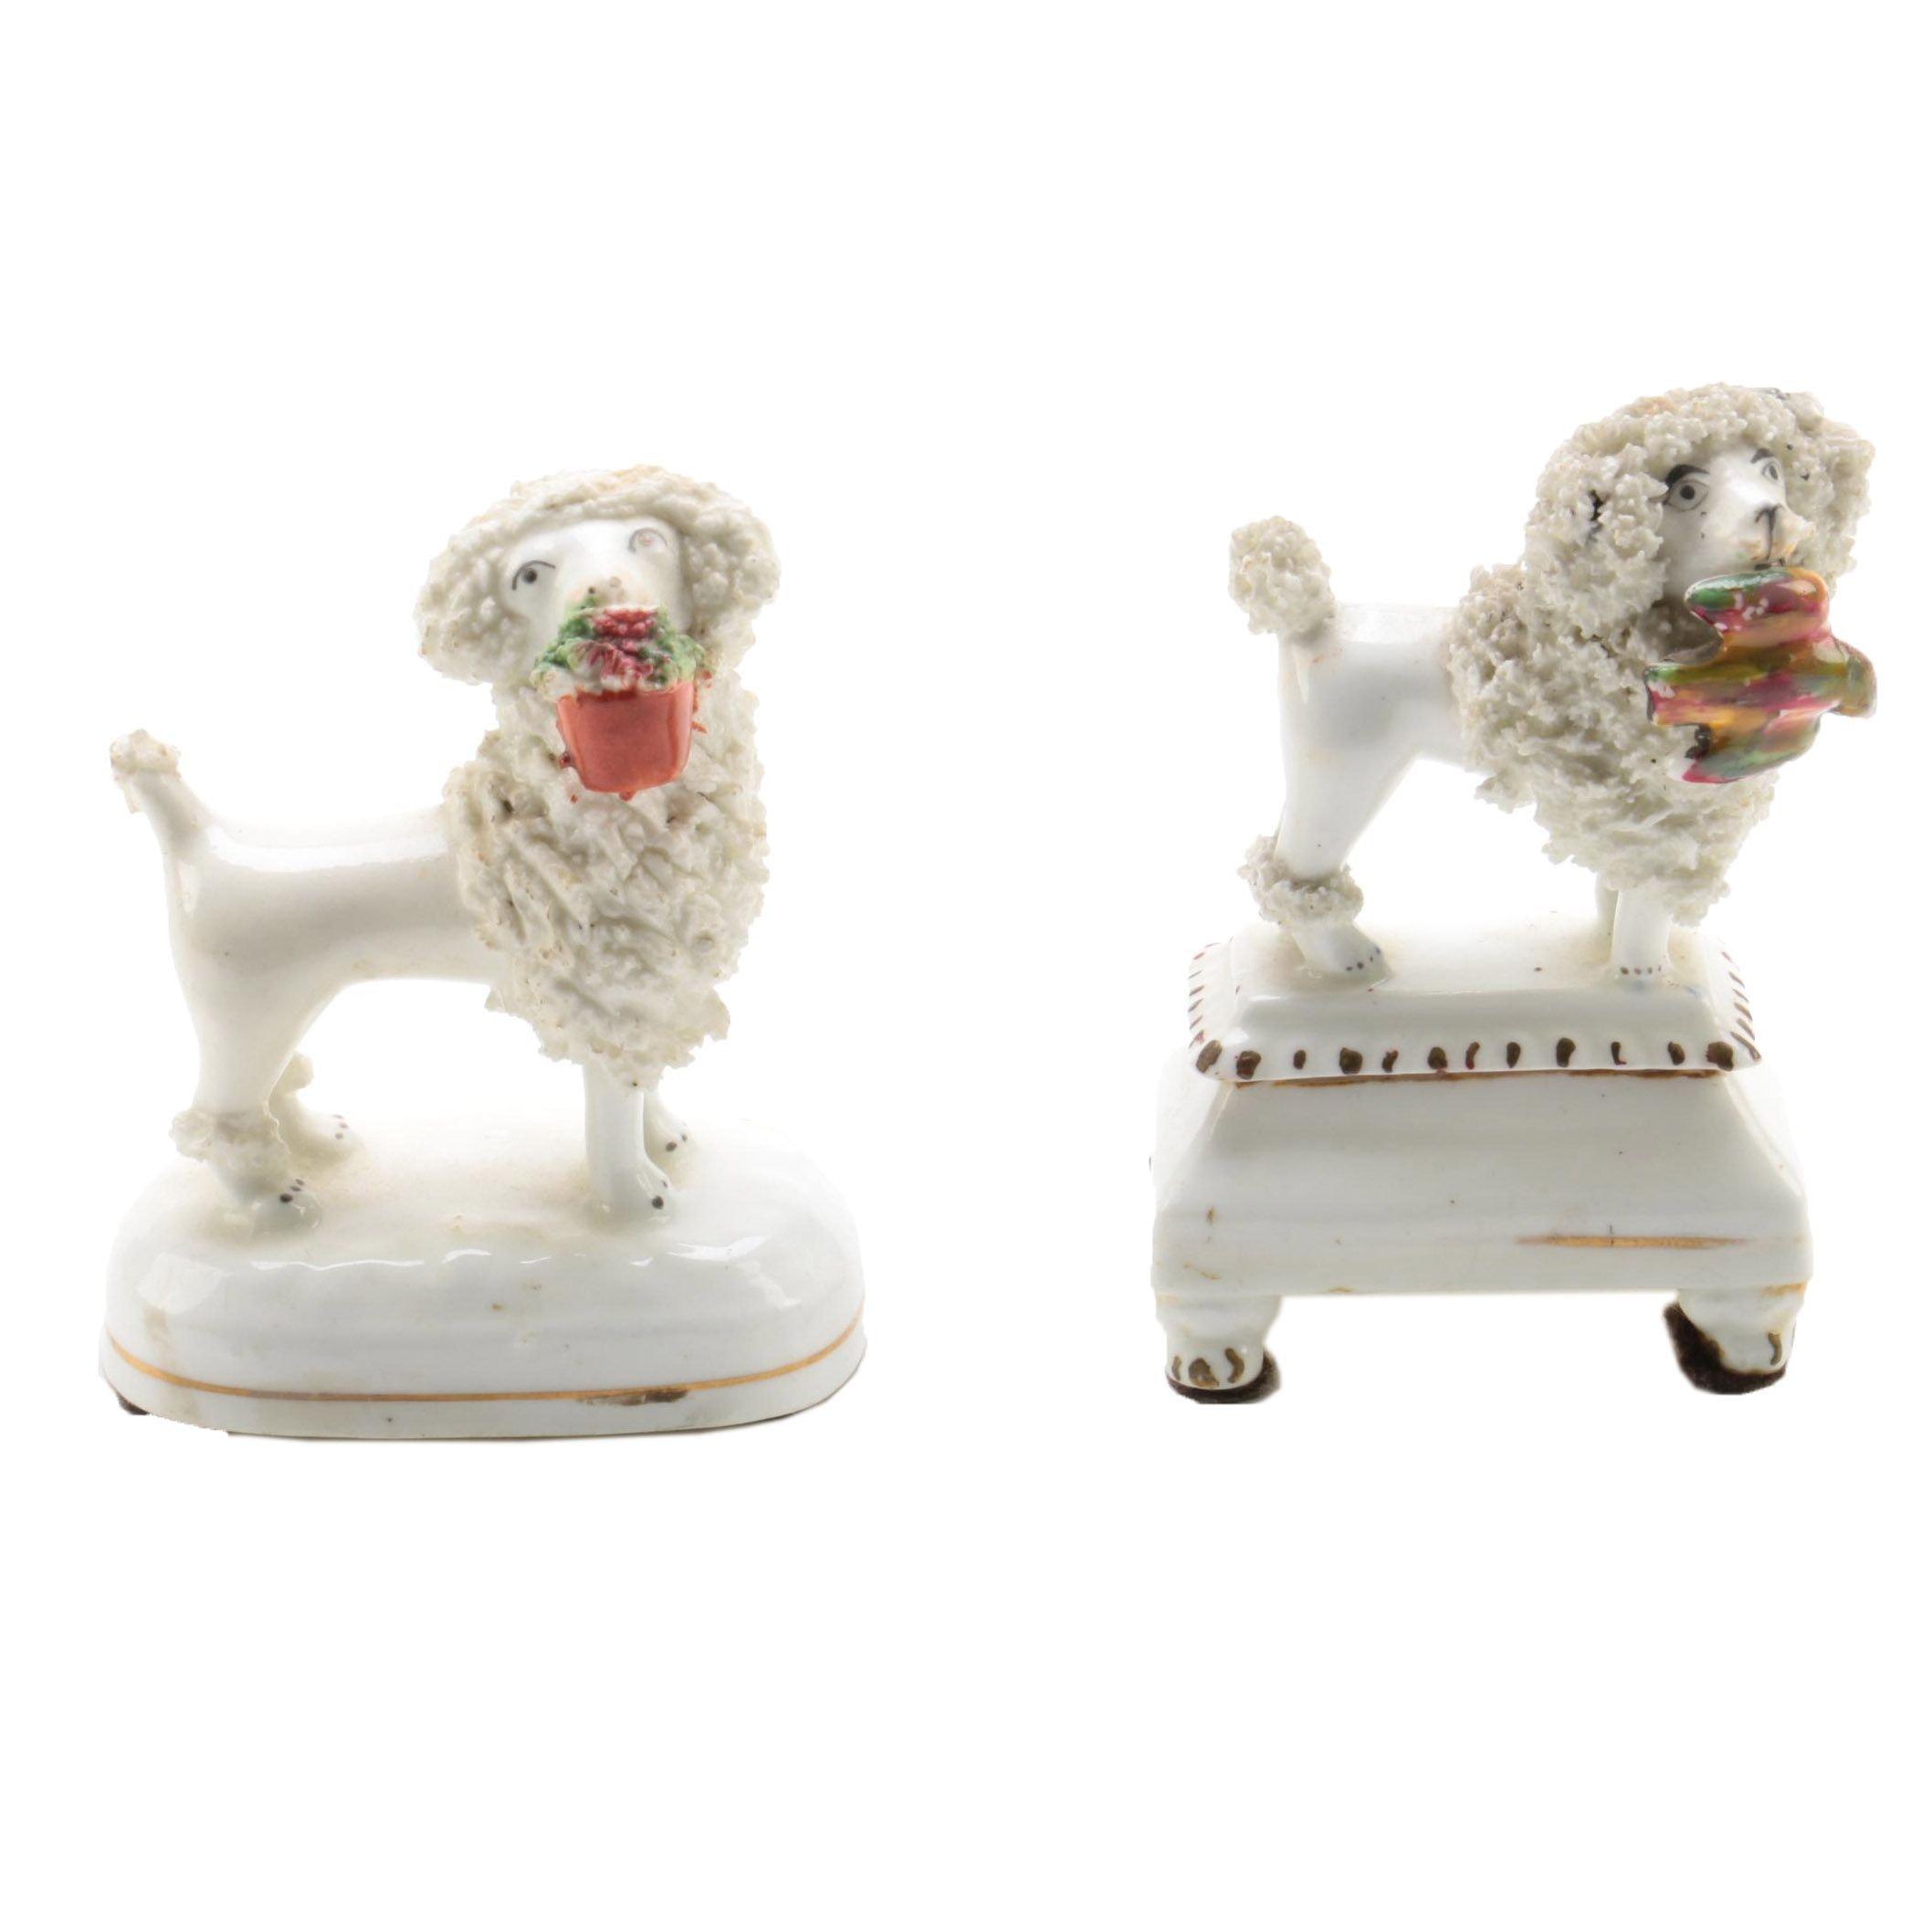 Antique Staffordshire Poodle Figurines